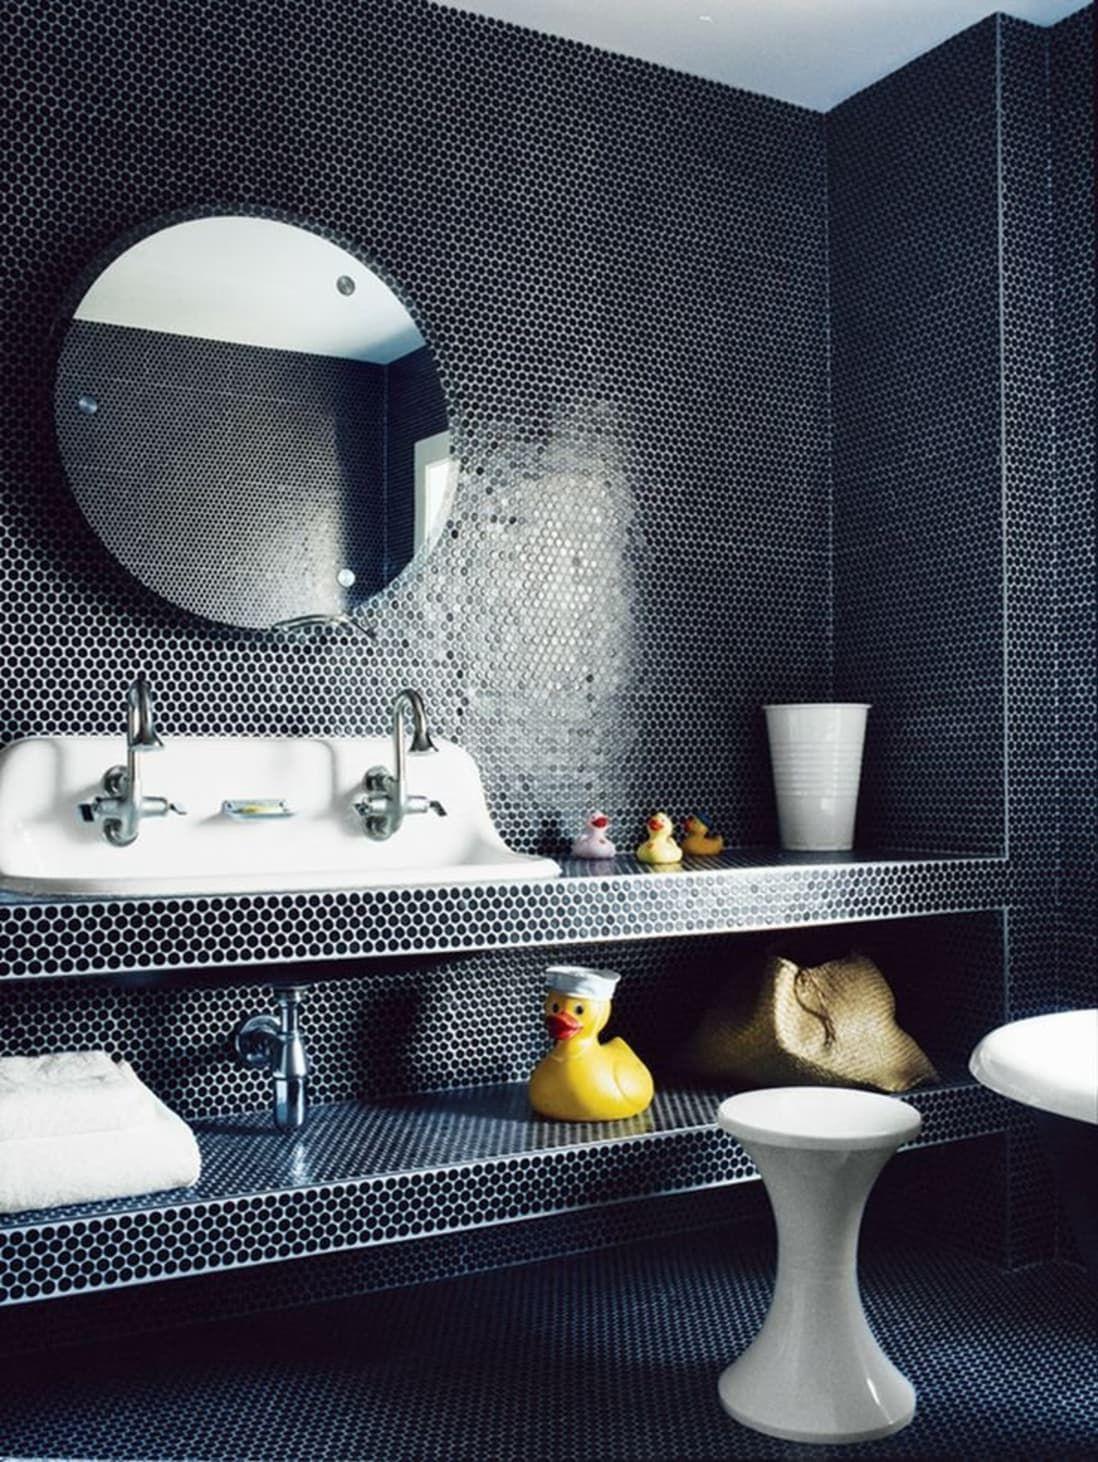 Look We Love Penny Tile In The Bathroom Penny Tiles Bathroom Bathroom Trends Small Bathroom Trends